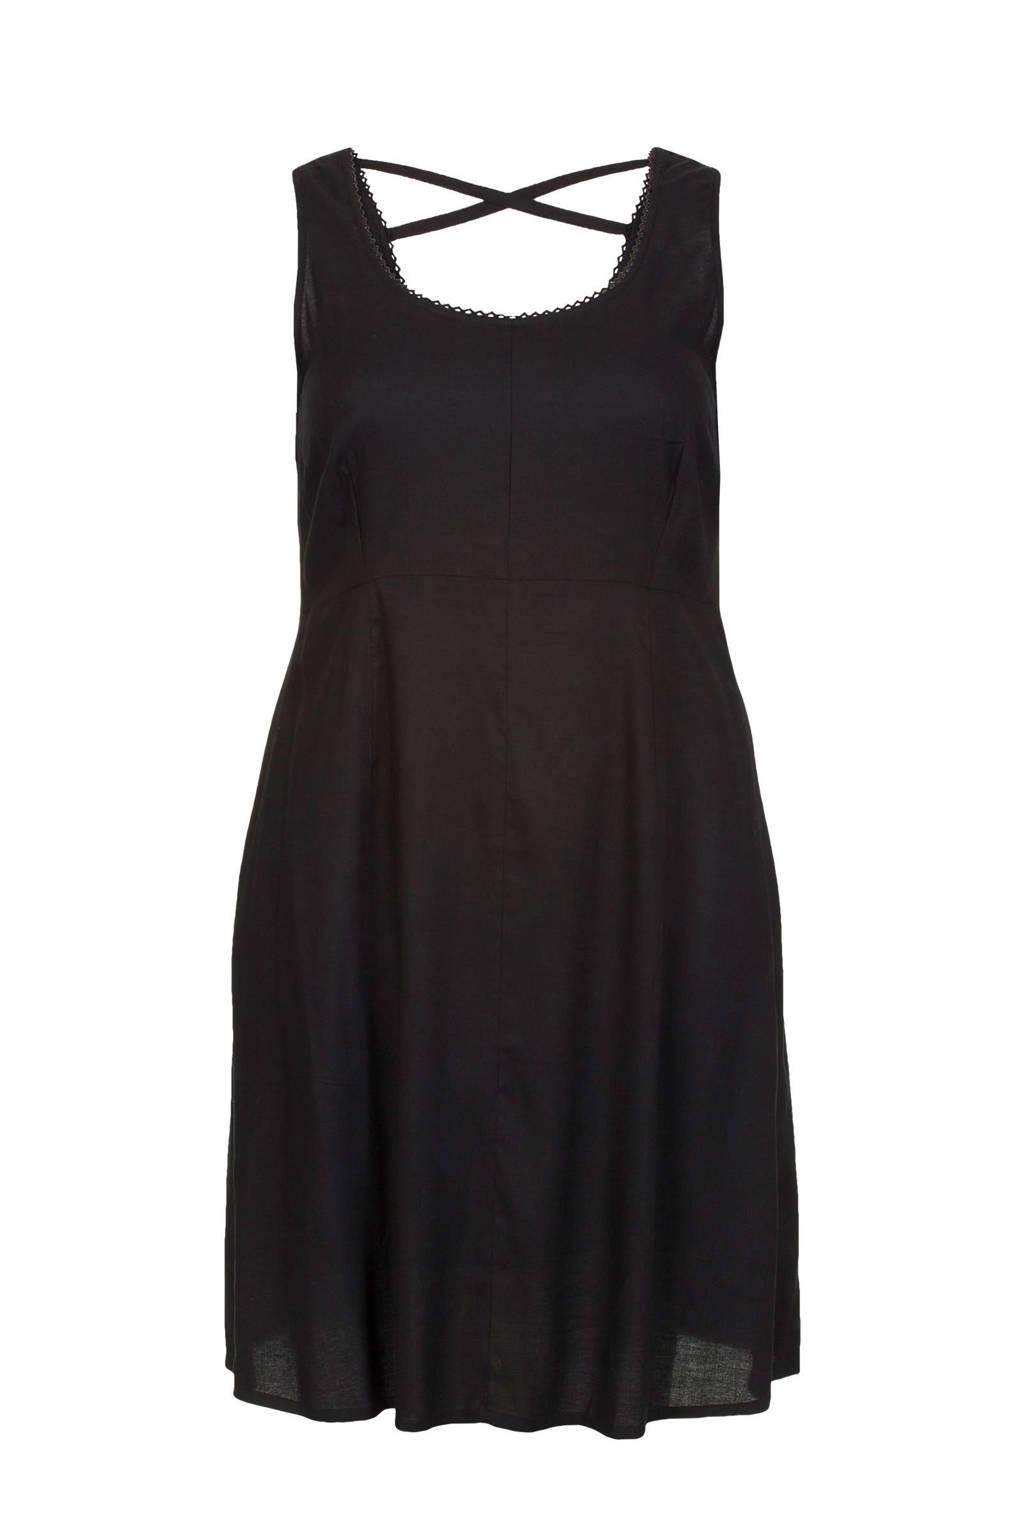 Miss Etam Plus jurk, Zwart